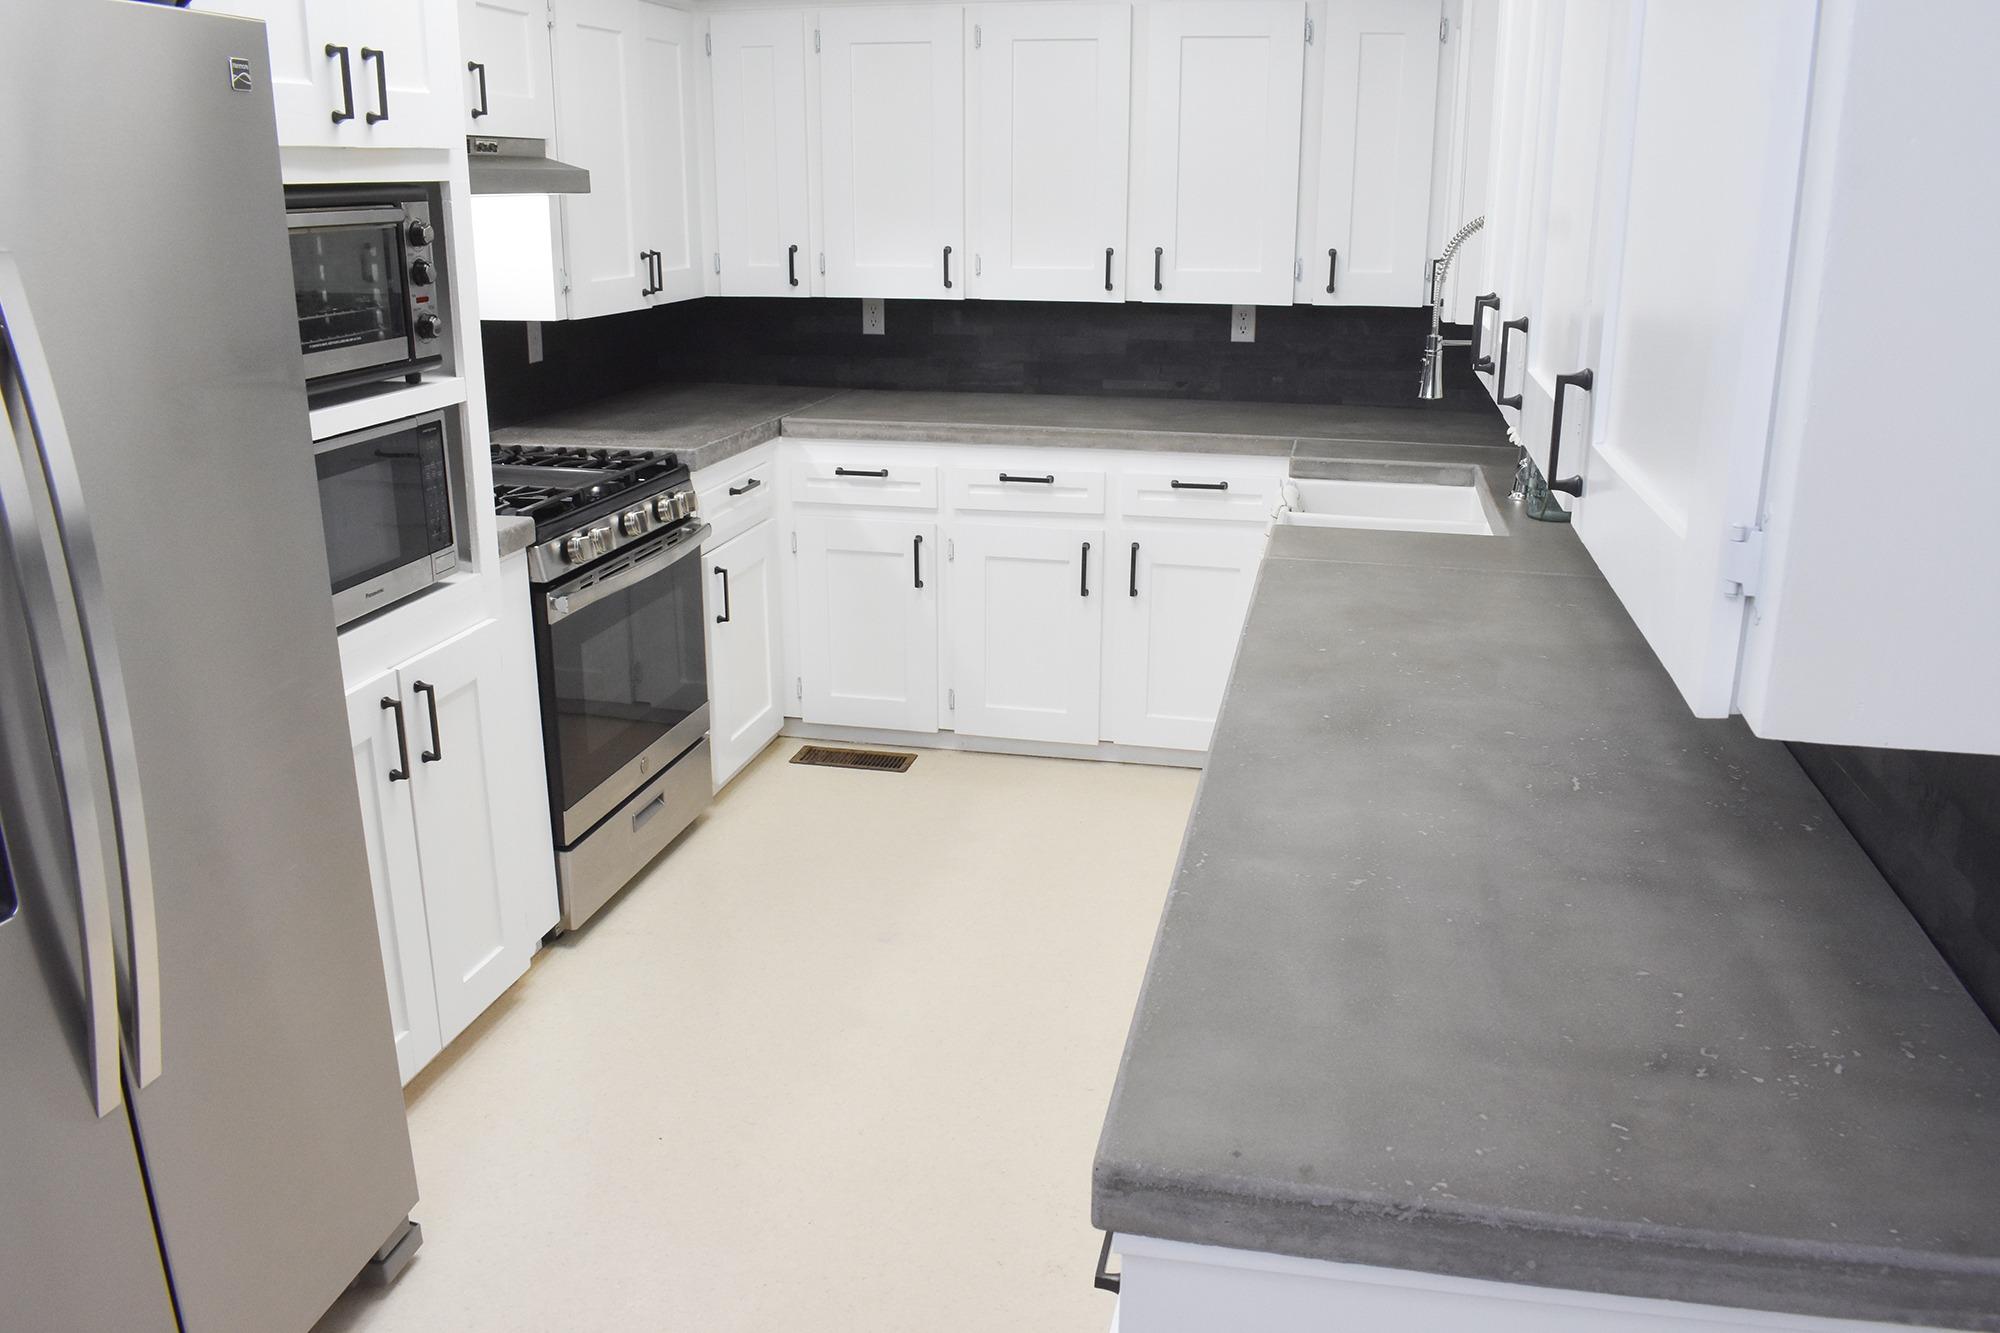 Diy Kitchen Renovation With Concrete